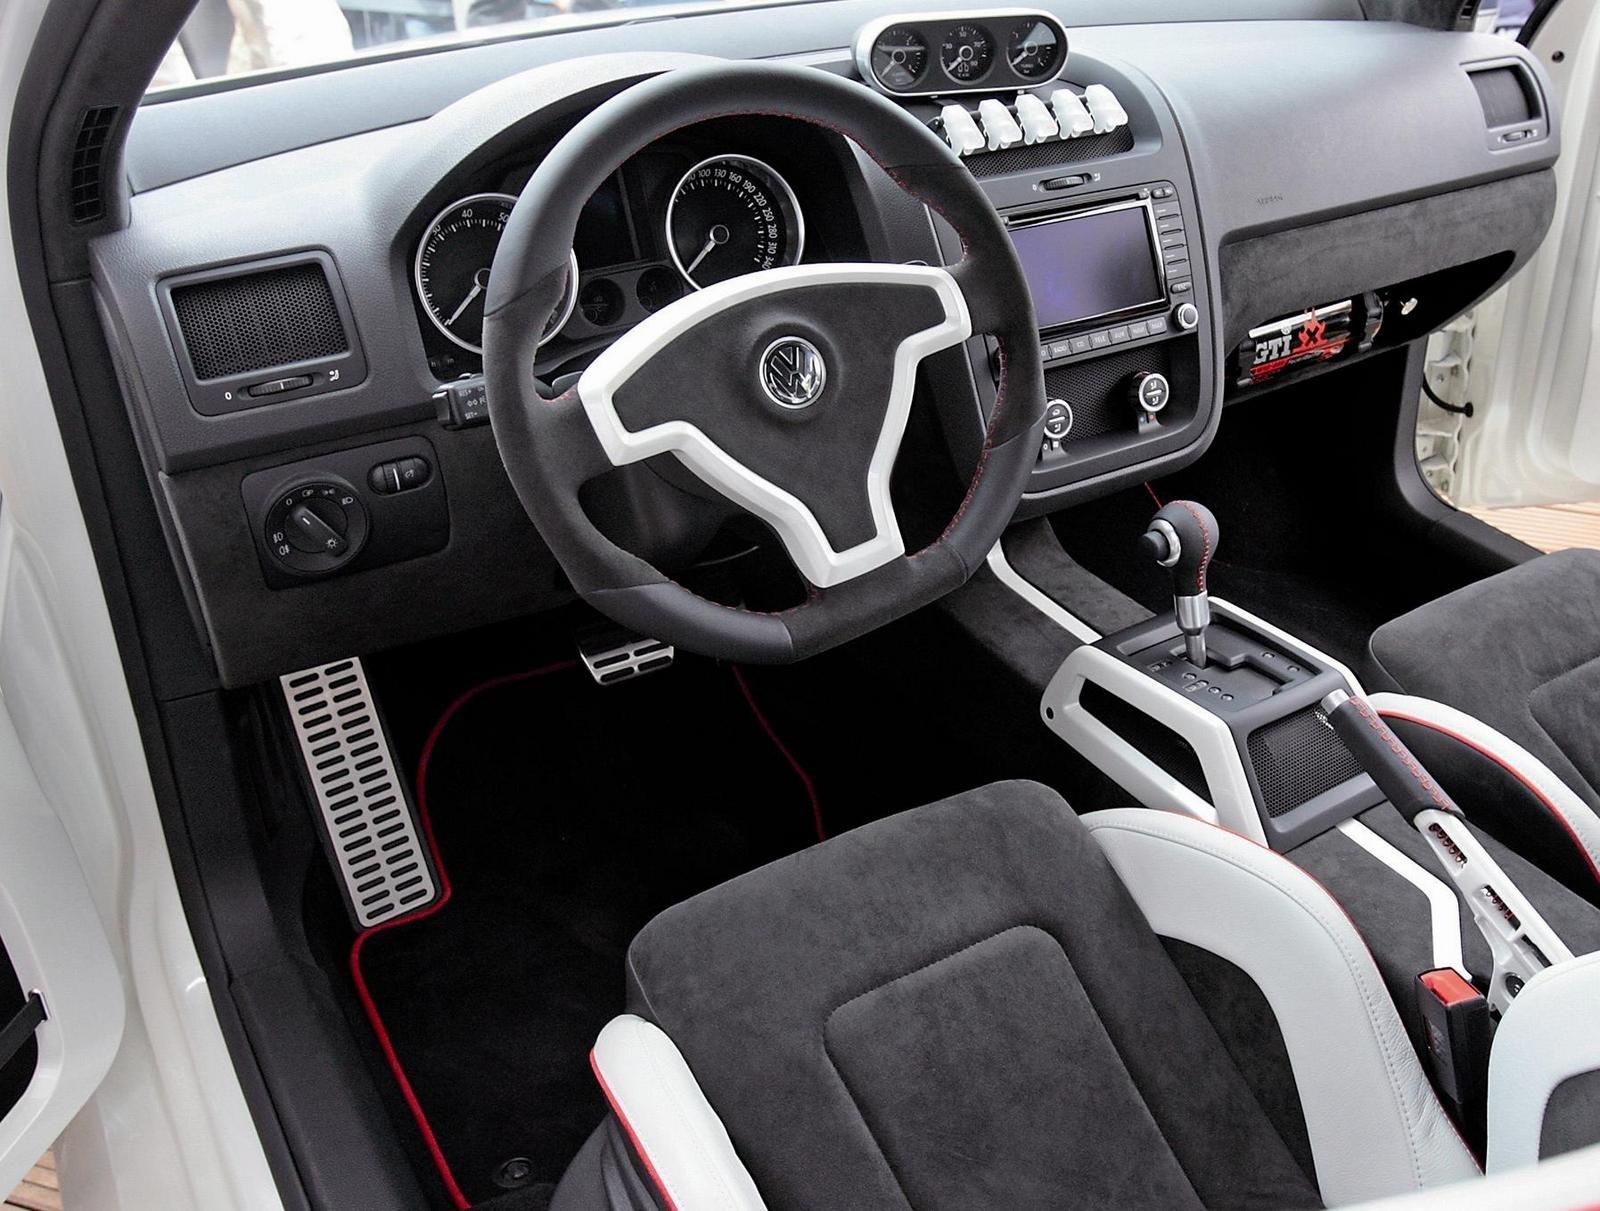 Volkswagen Golf GTI W12-650 Concept Download